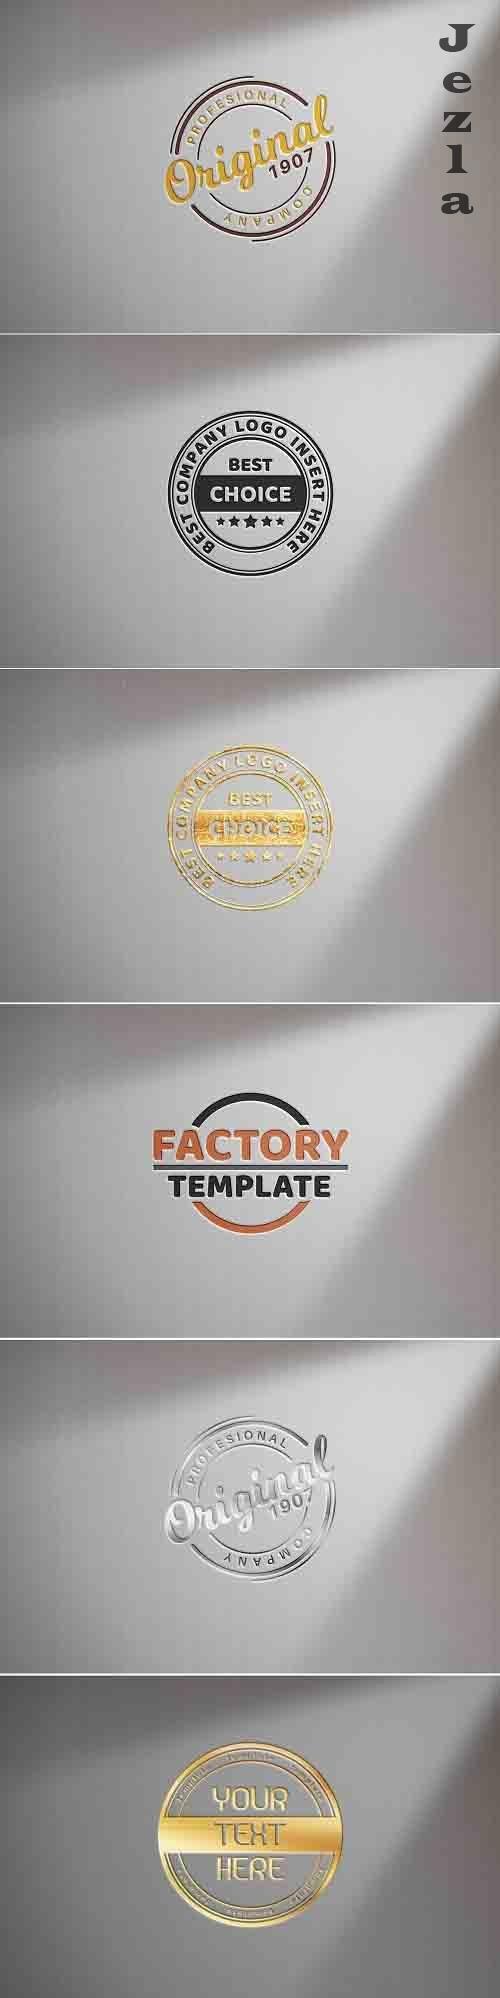 Logo on white paper - mockup template - 6172457